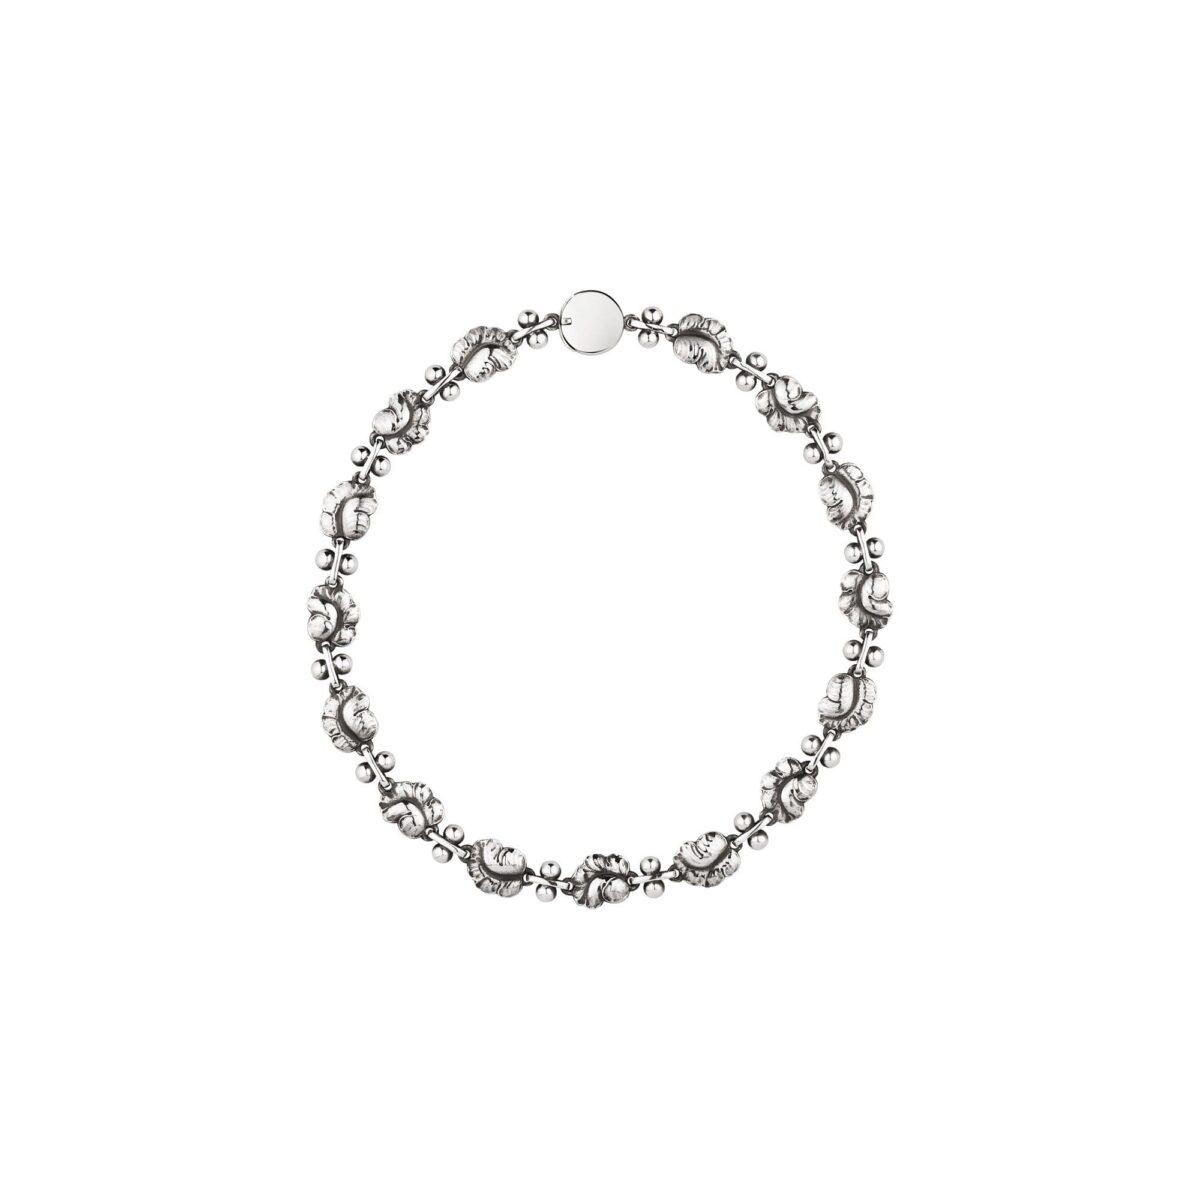 Georg Jensen Moonlight Grapes Necklace